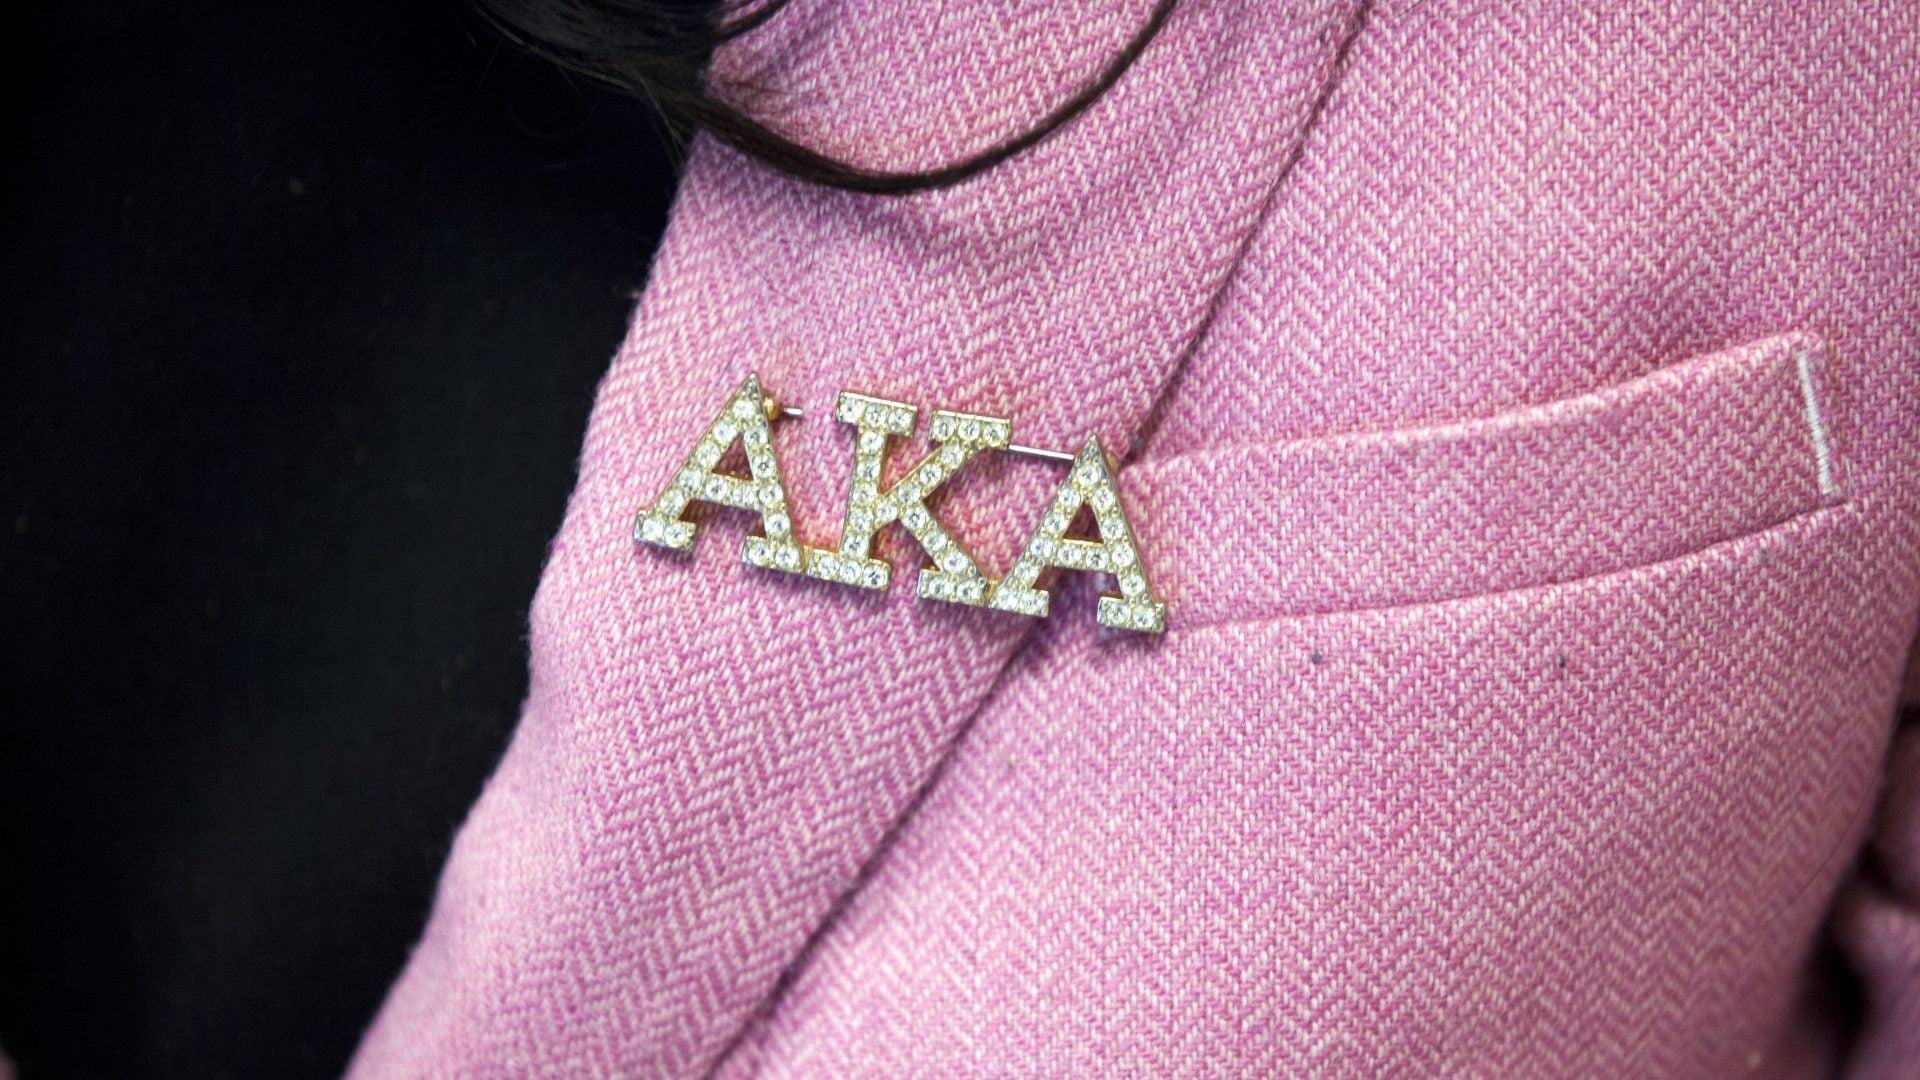 Alpha Kappa Alpha Sorority Donates $100,000 To Chicago State University